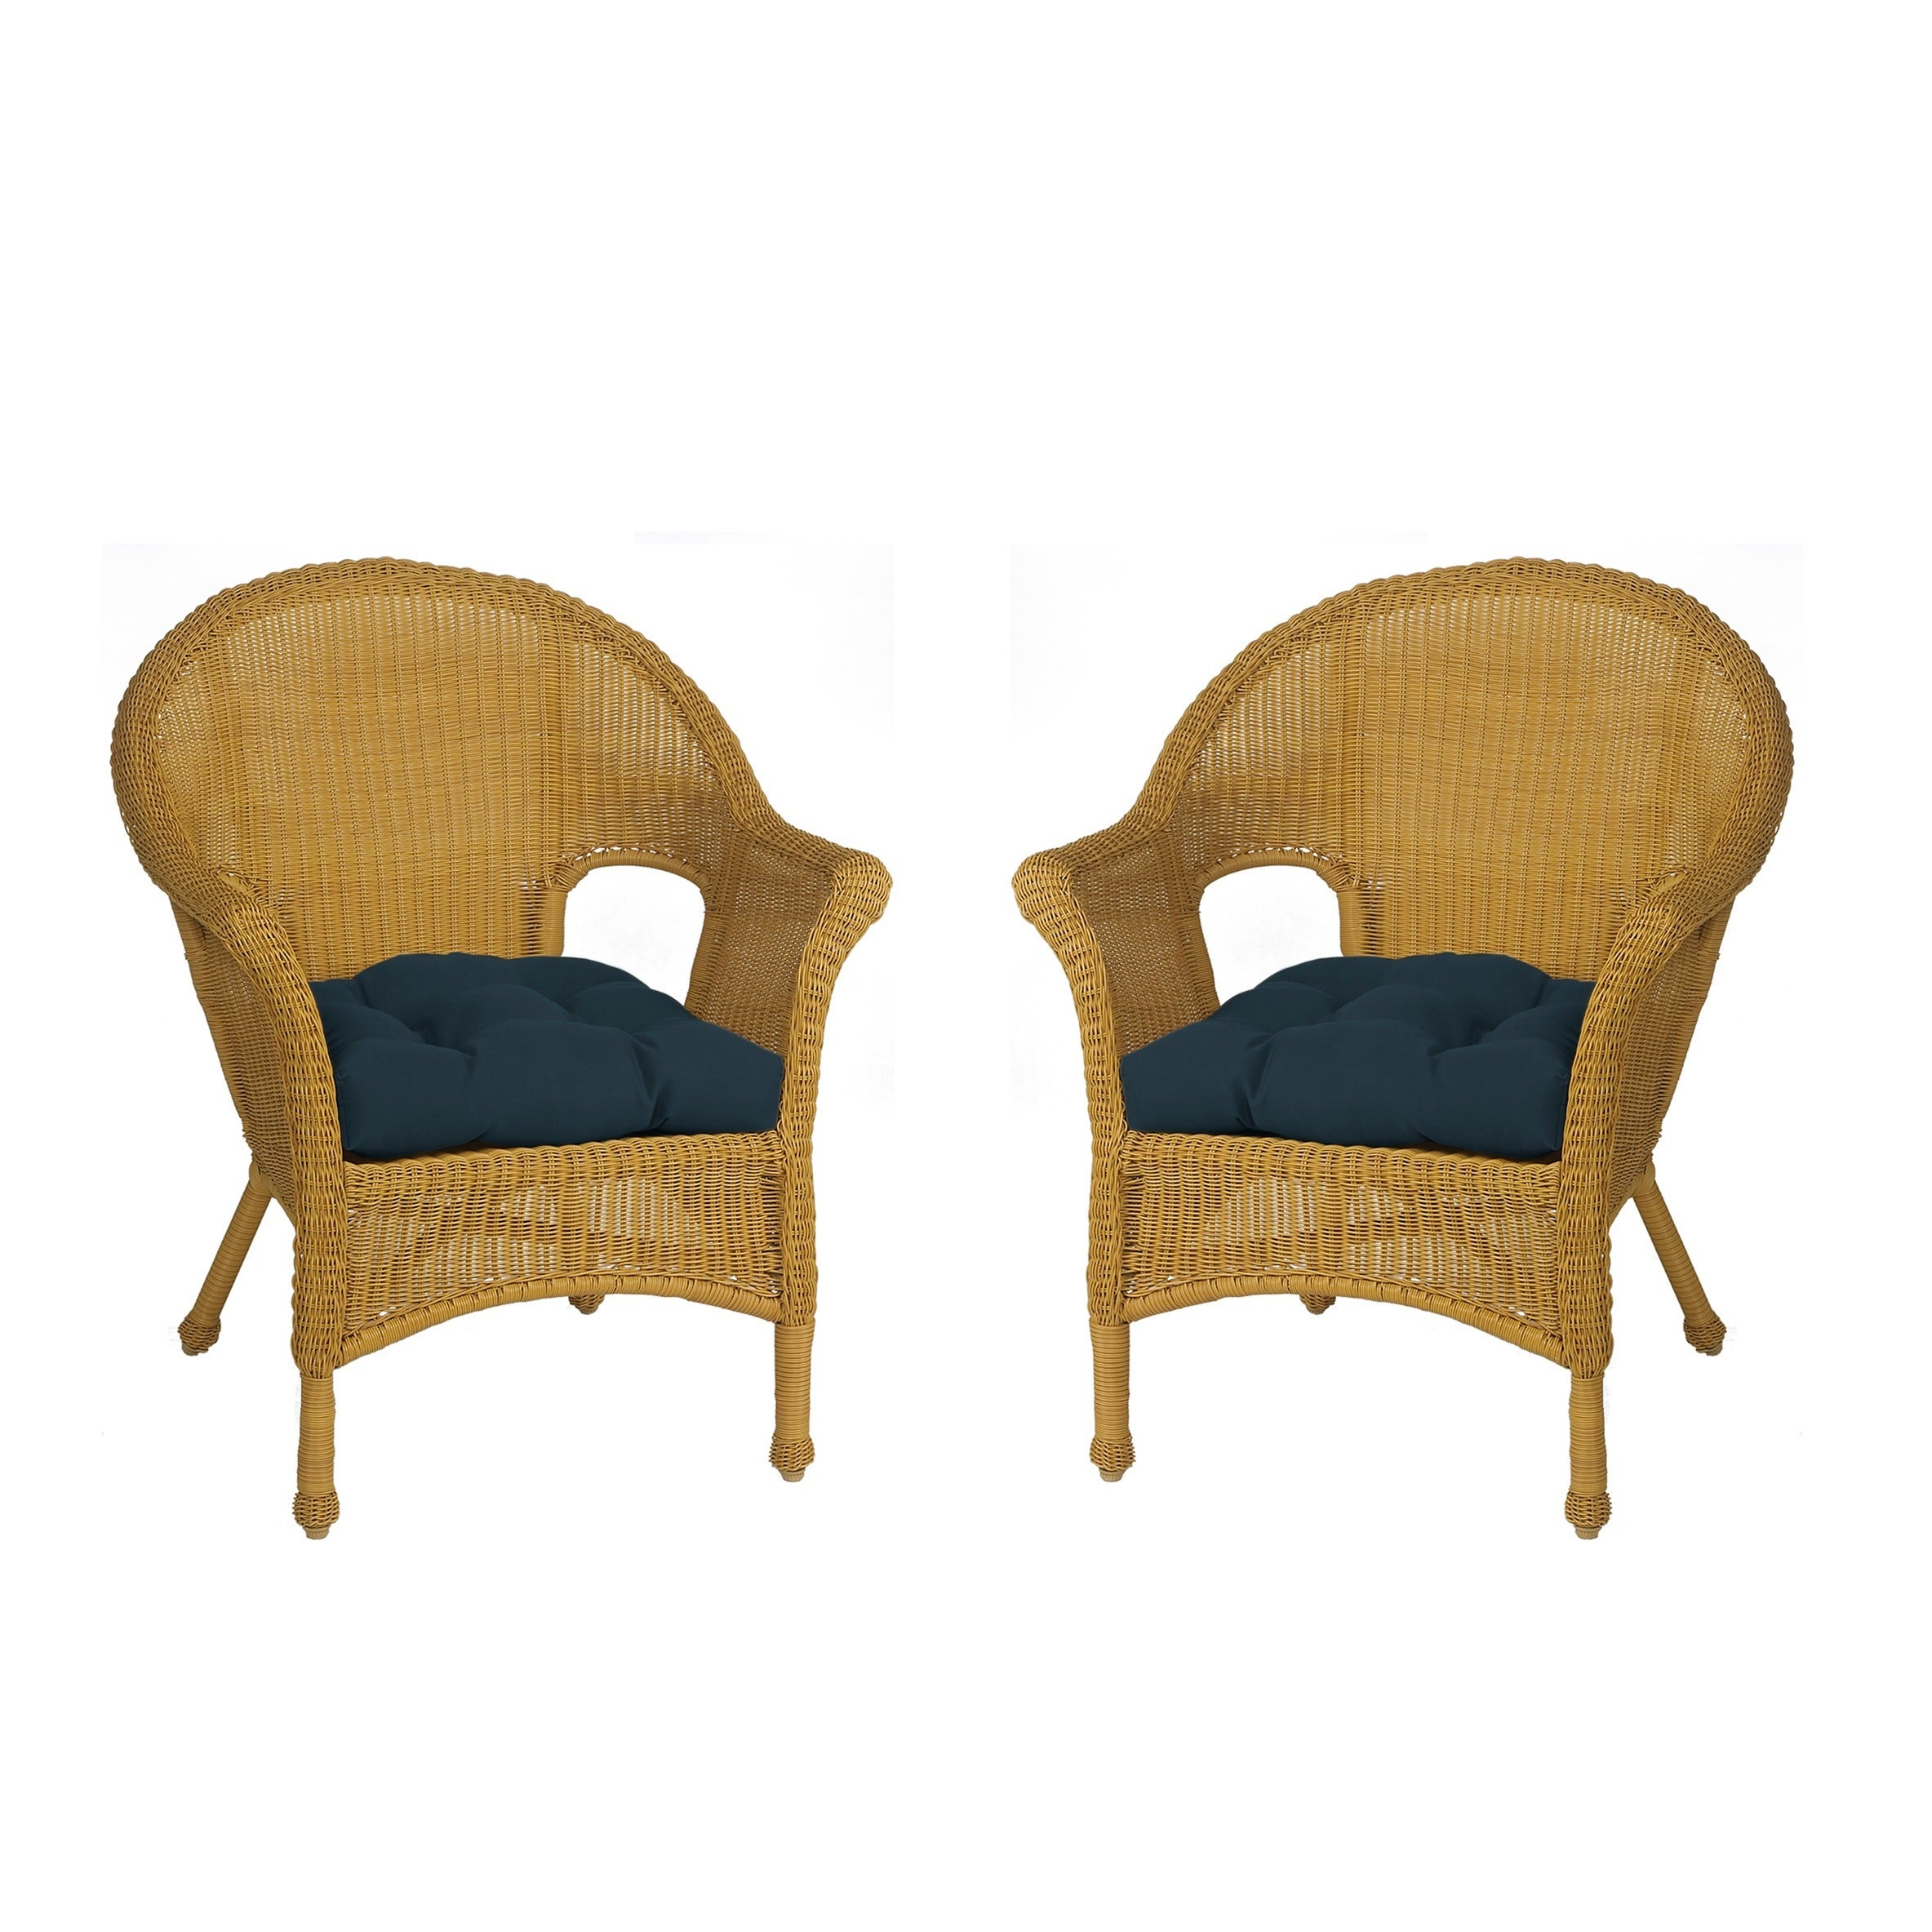 Outdoor Navy Blue Wicker Chair Cushion